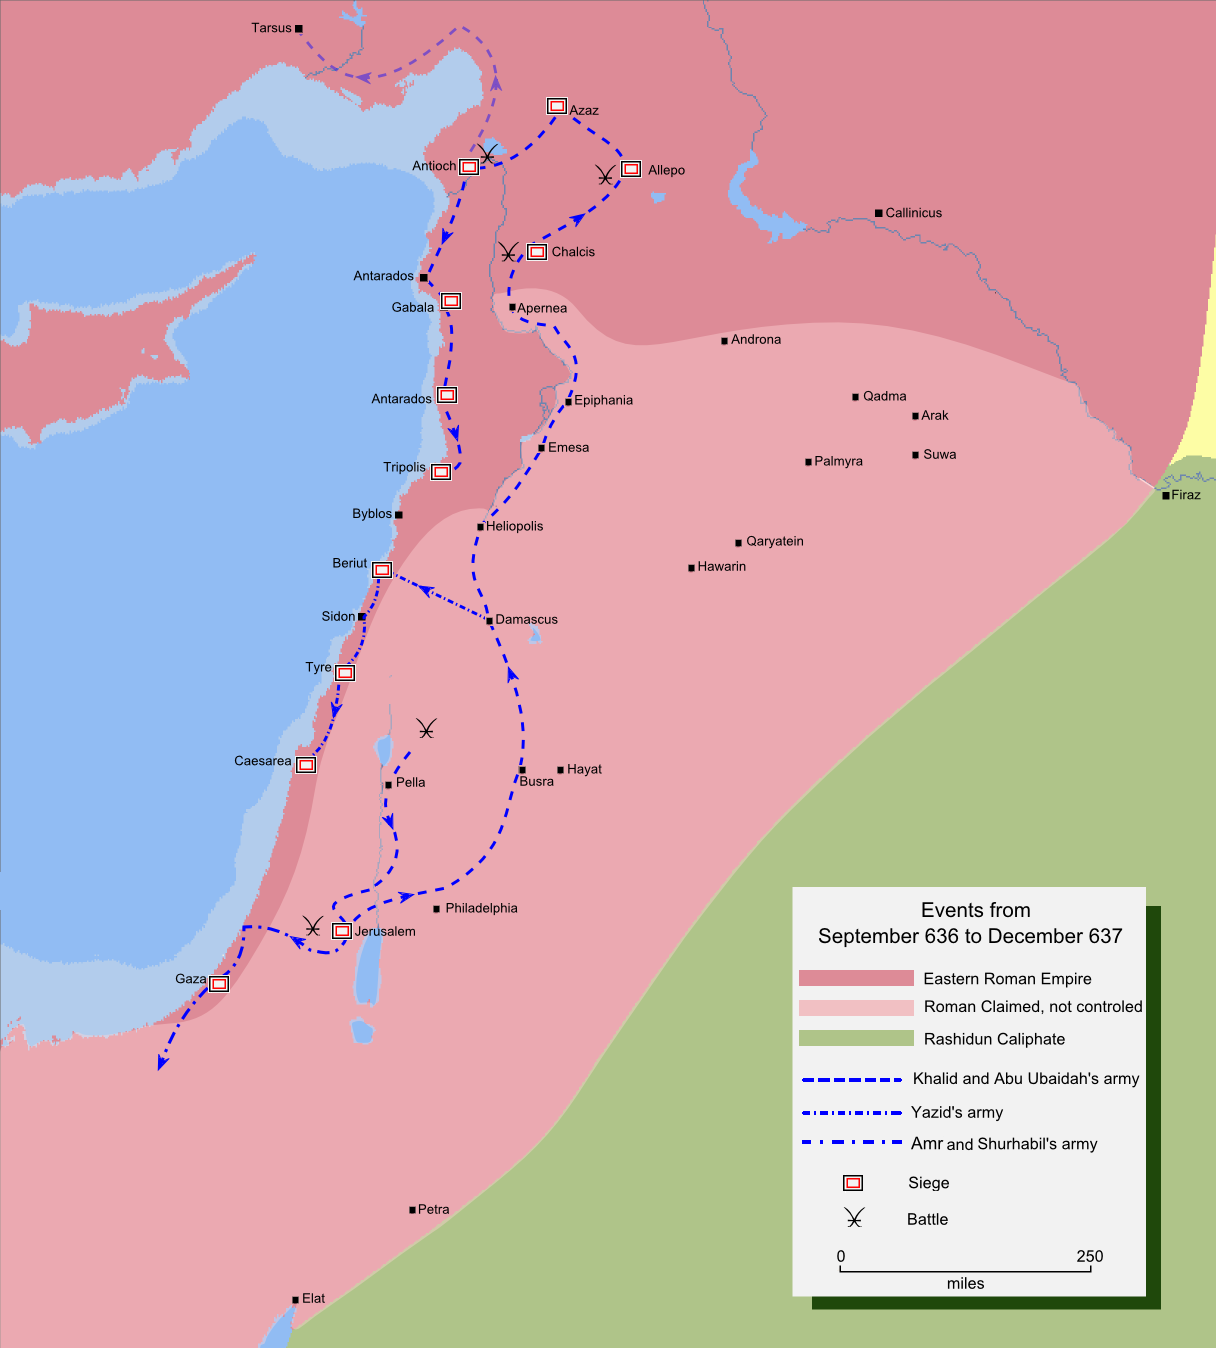 Muslim's invasion of northern Syria 636-637